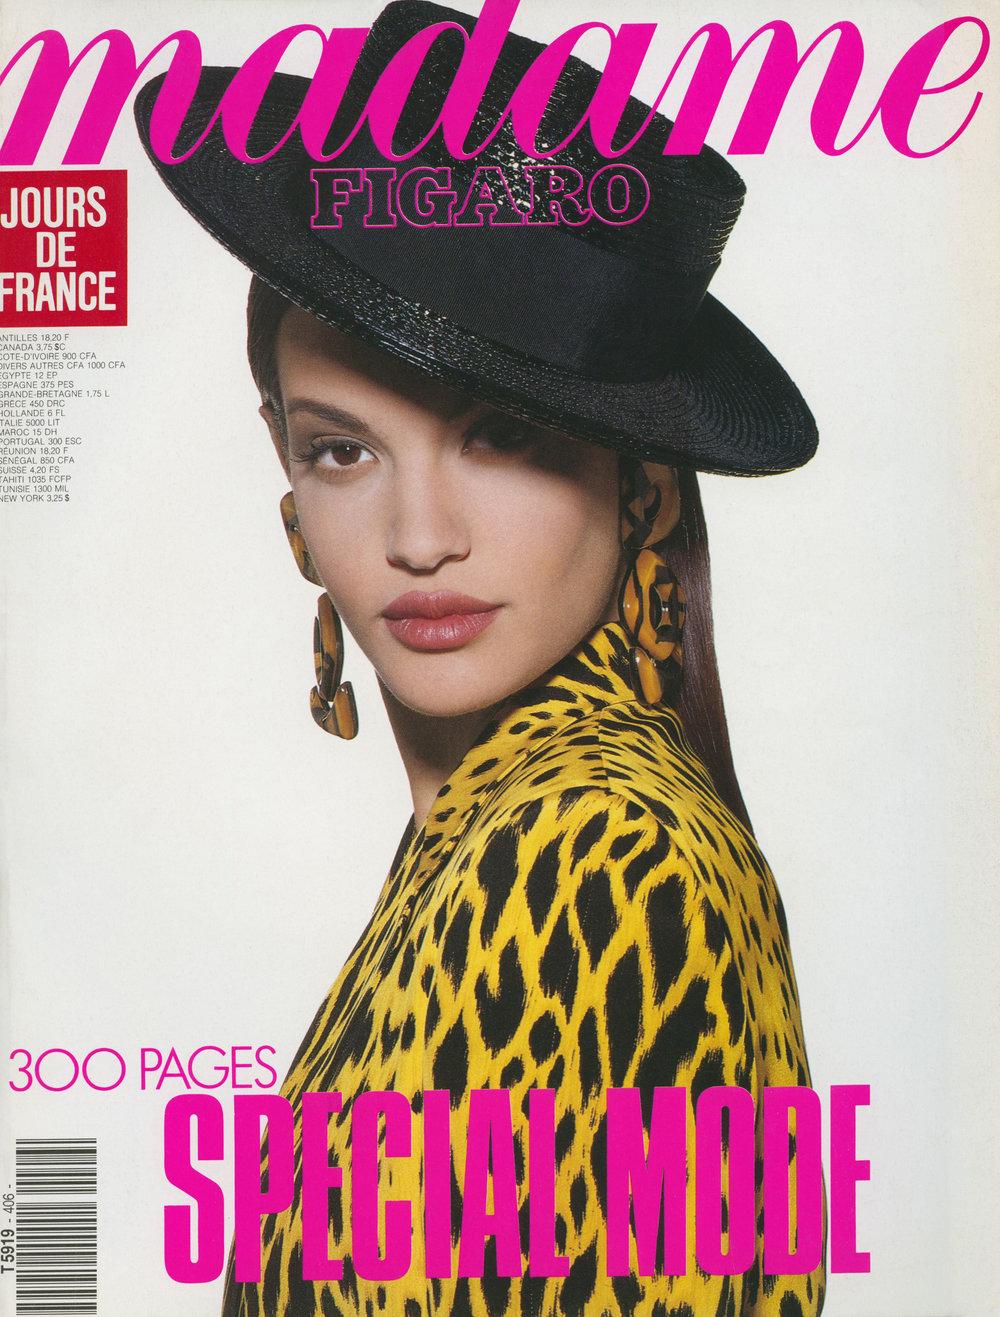 Madame Figaro Cover, Tyen